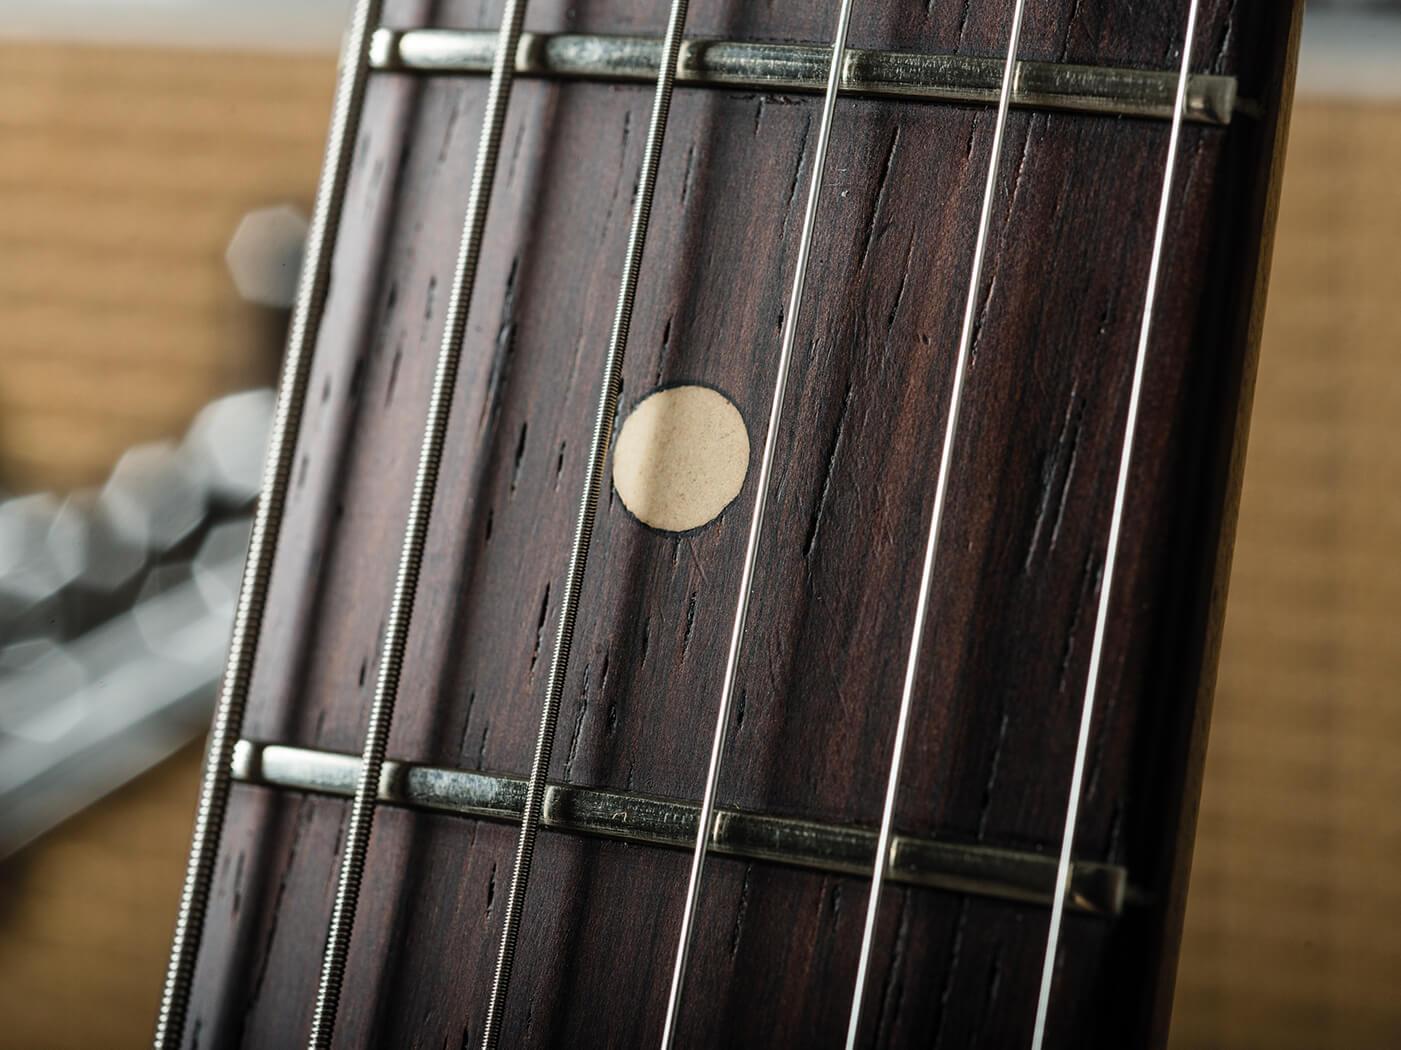 Fender Pre-CBS Fiesta Red Strat fingerboard close-up